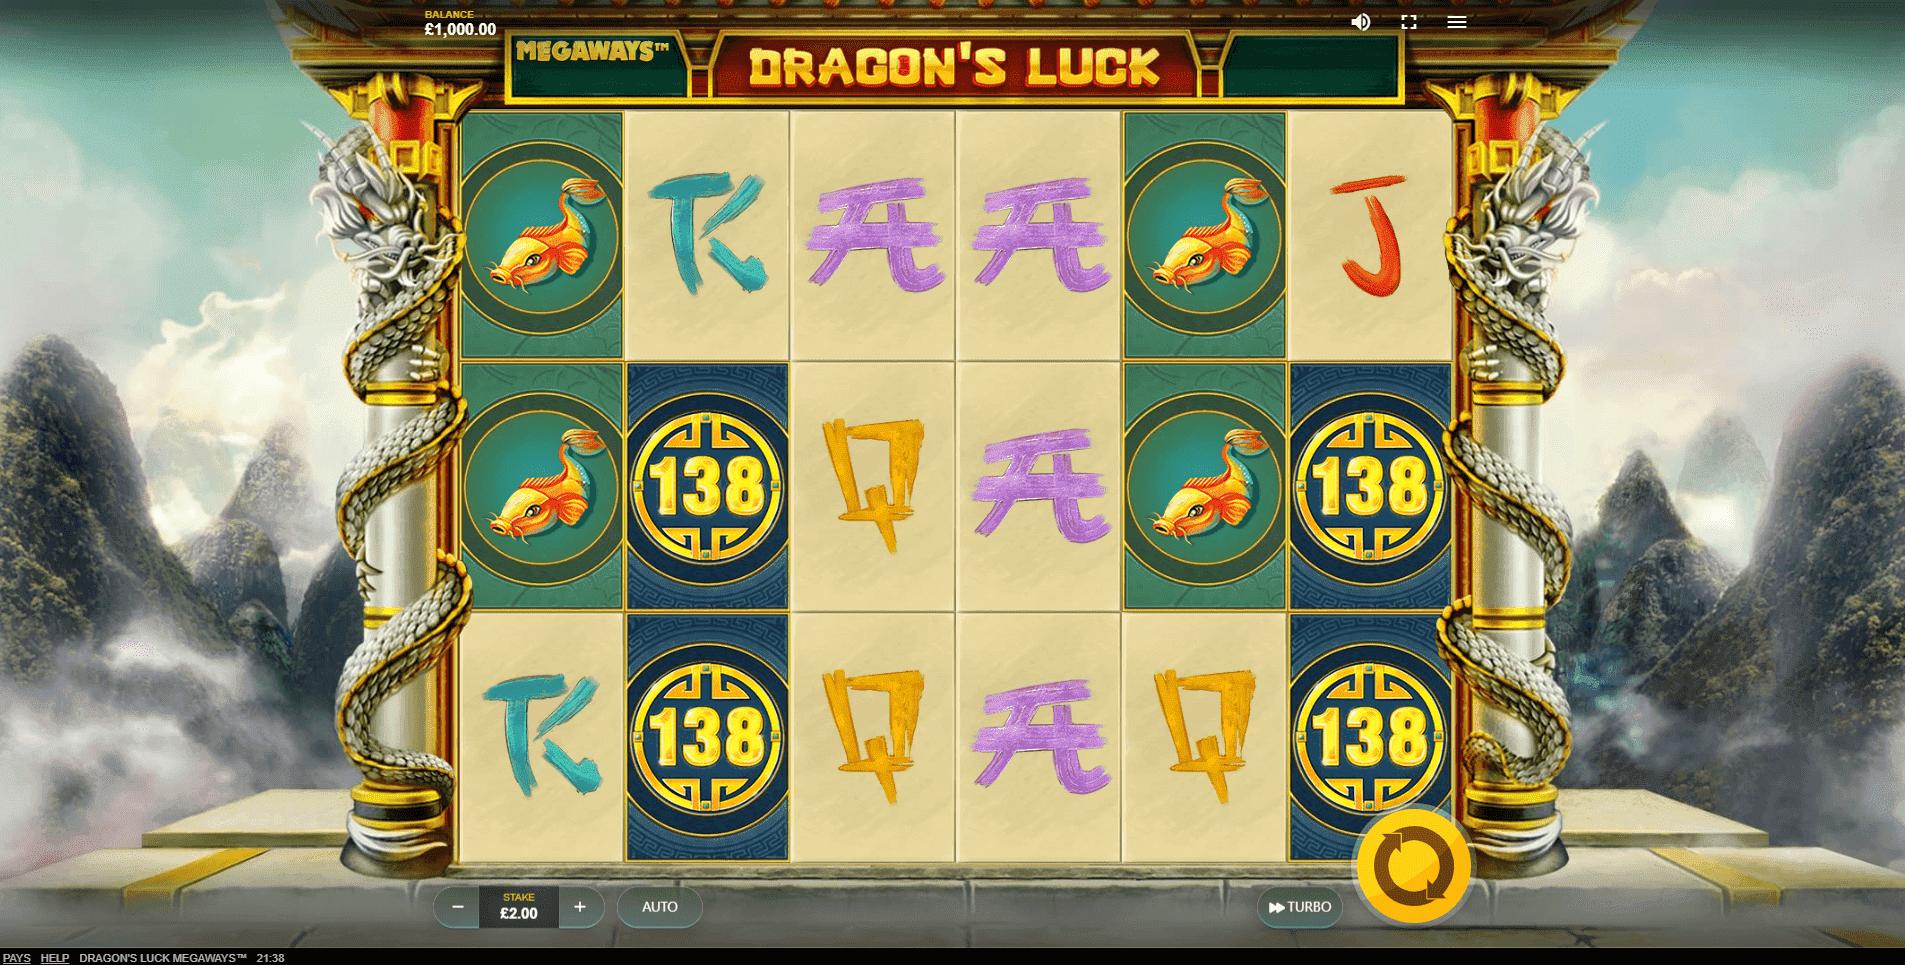 Dragons Luck Megaways slot machine screenshot